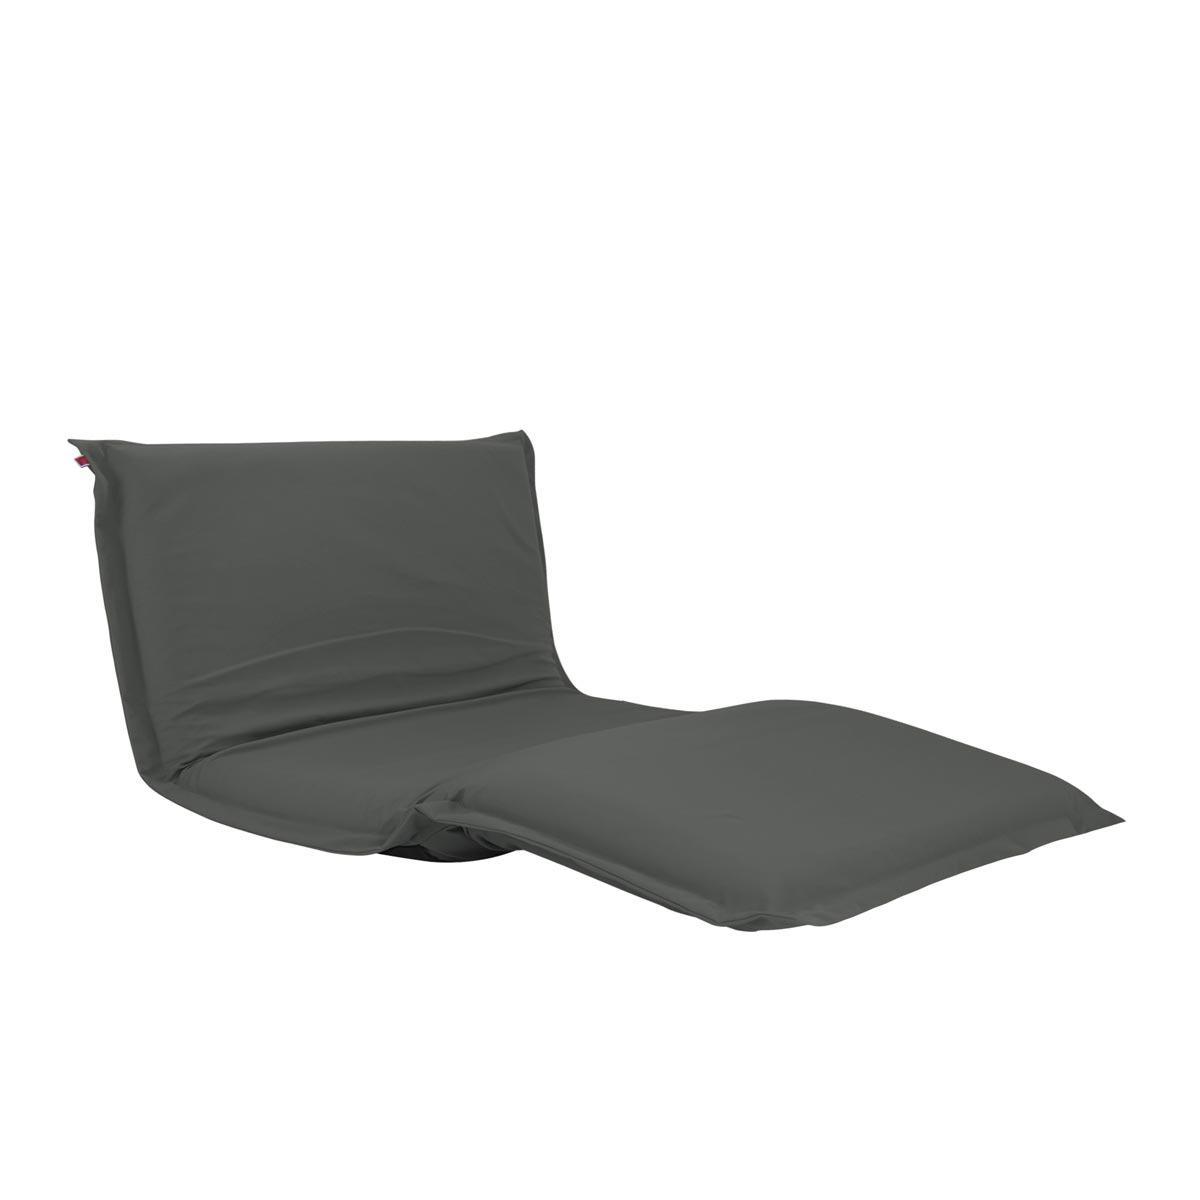 Pufe ClicClac Duo Lounge Tecido LN03 Cinza Escuro 02 03